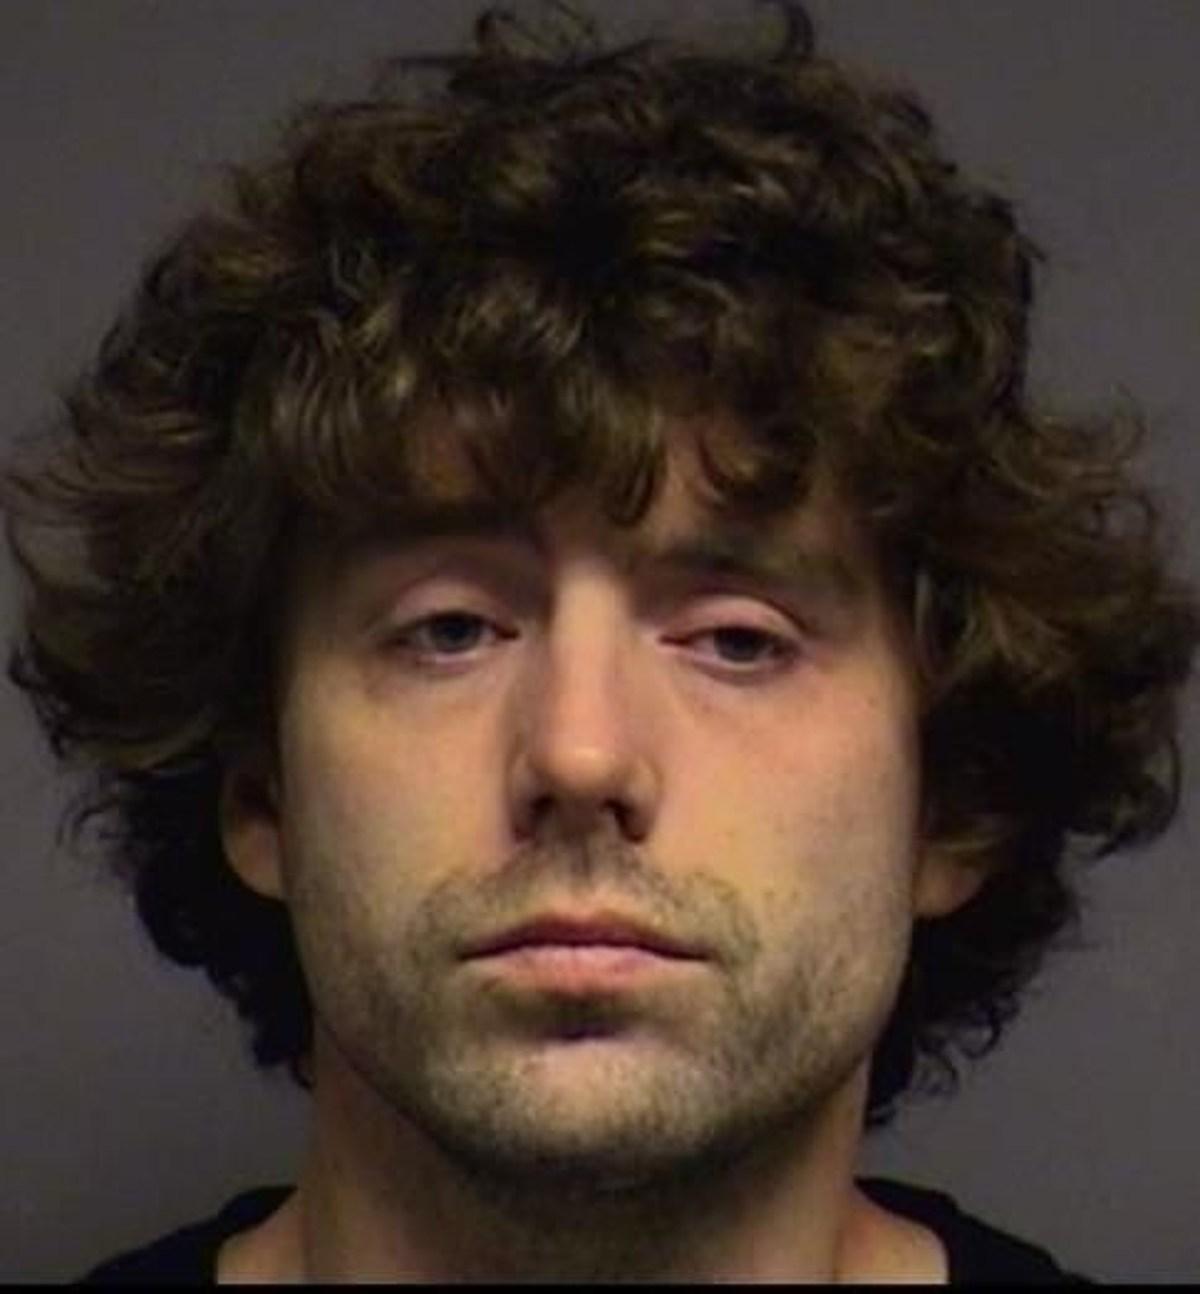 McDonalds Gang Assault Suspect is Featured Warrant